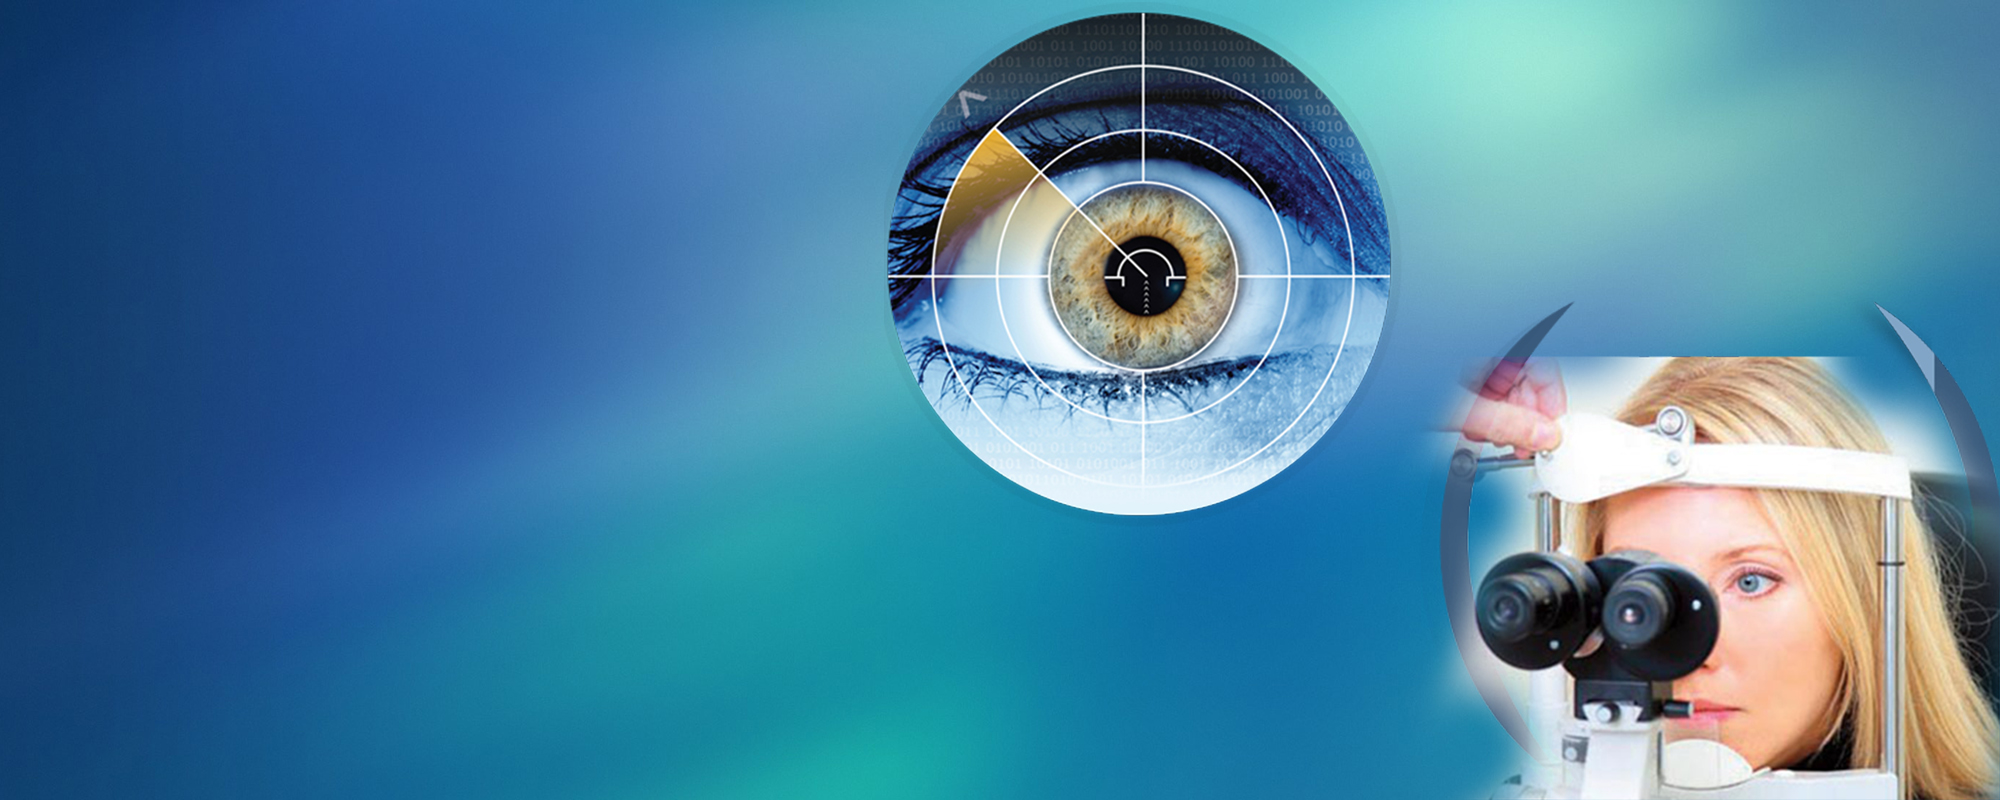 Göz Kontrolü Slider